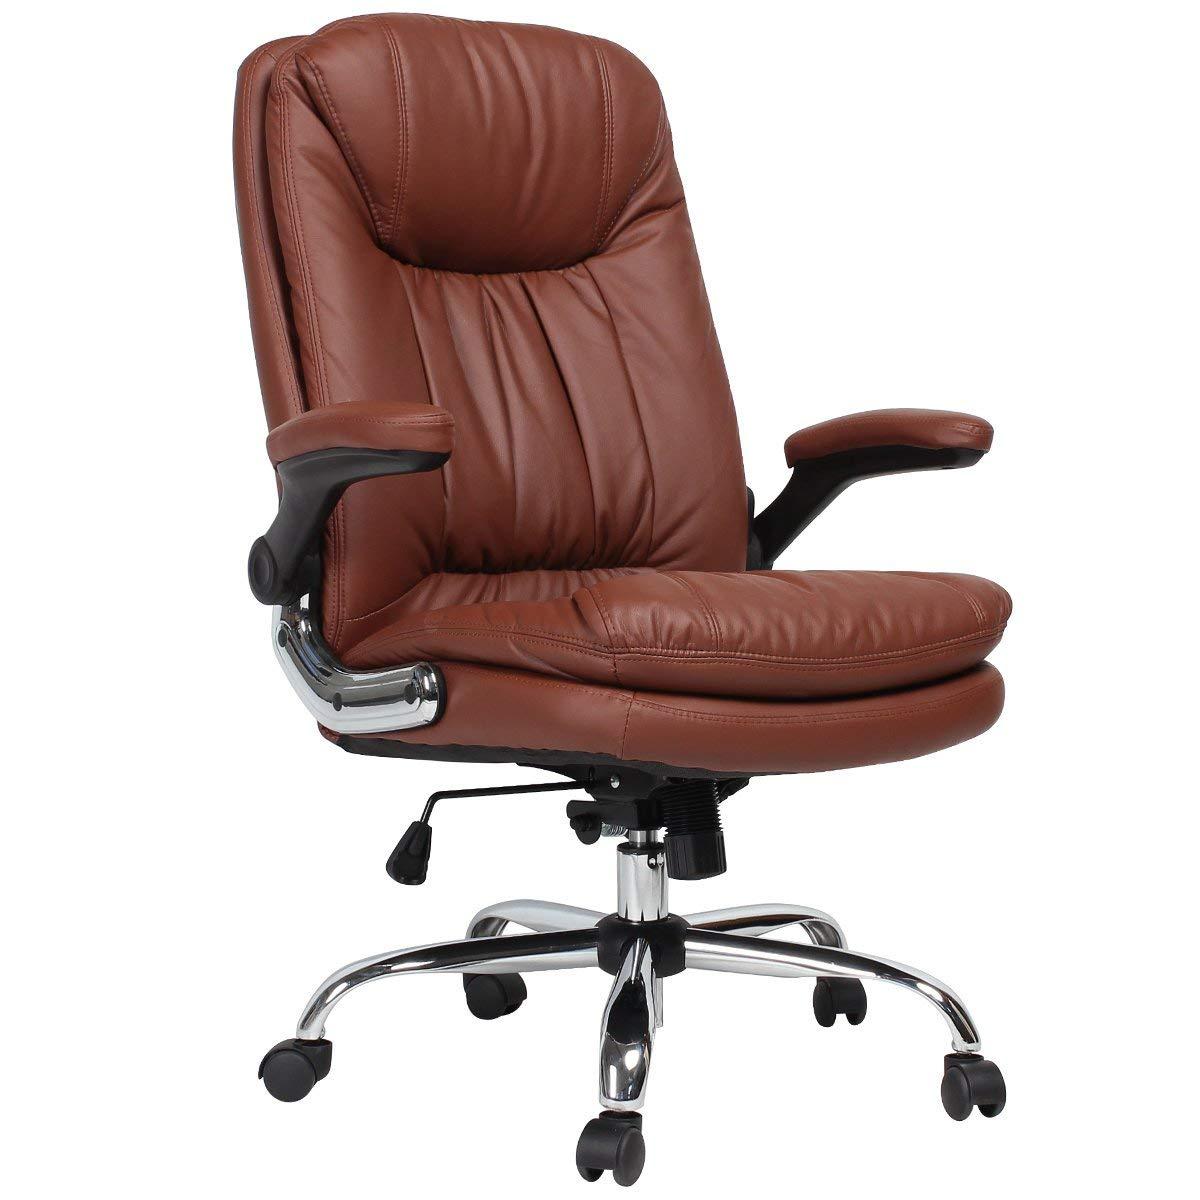 YAMASORO Ergonomic High Back Executive Office Chair